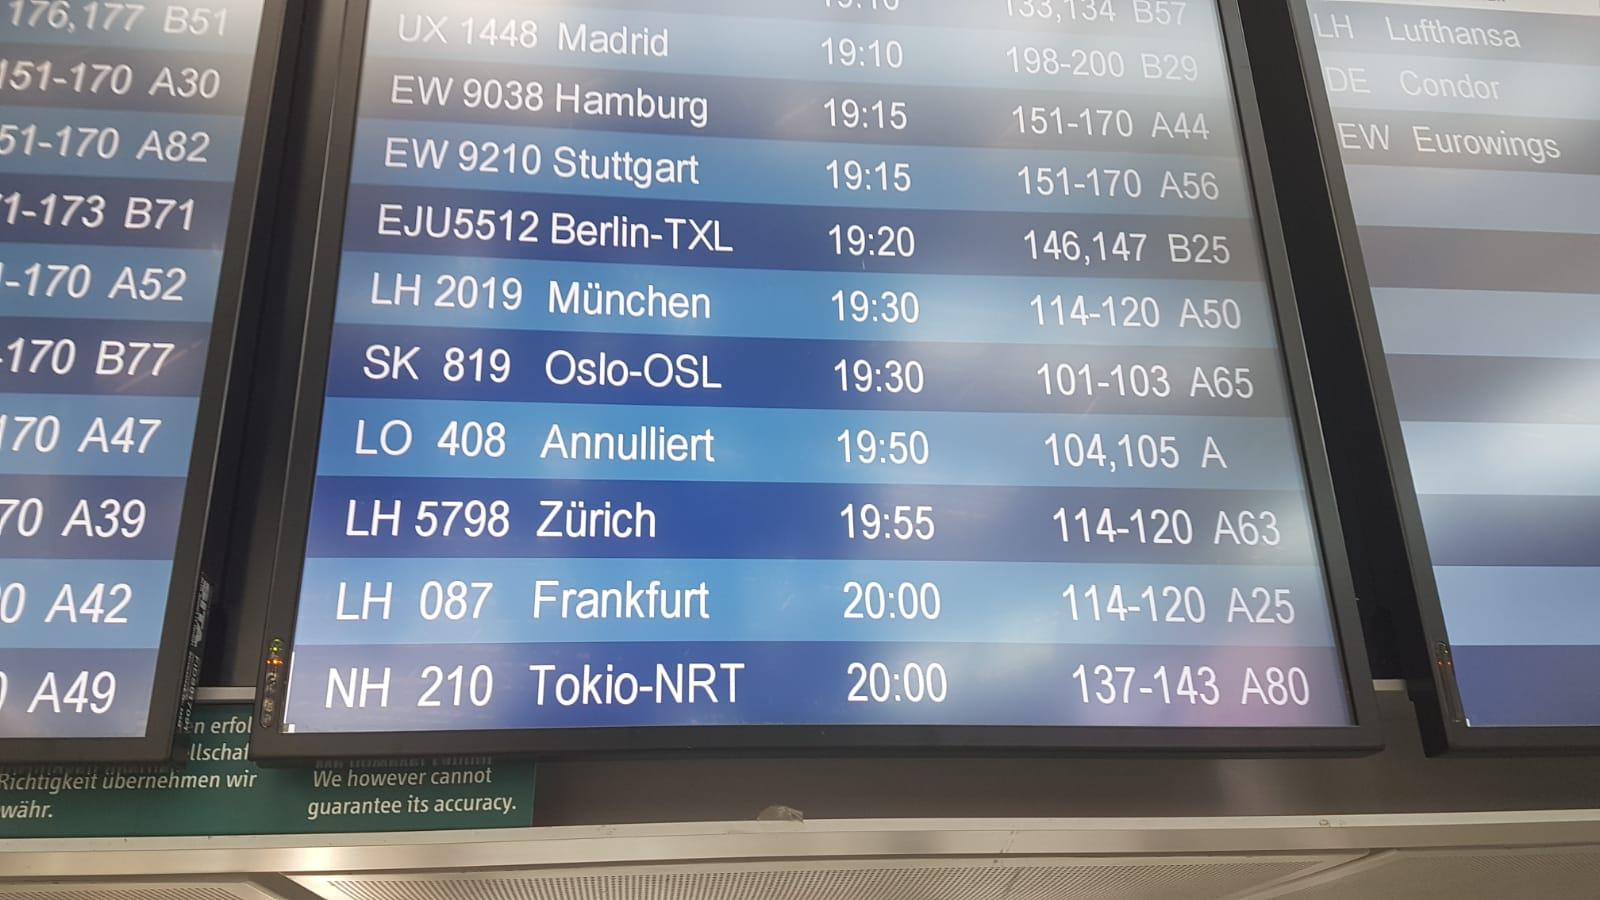 LOT Polish Airlines Customer Reviews | SKYTRAX